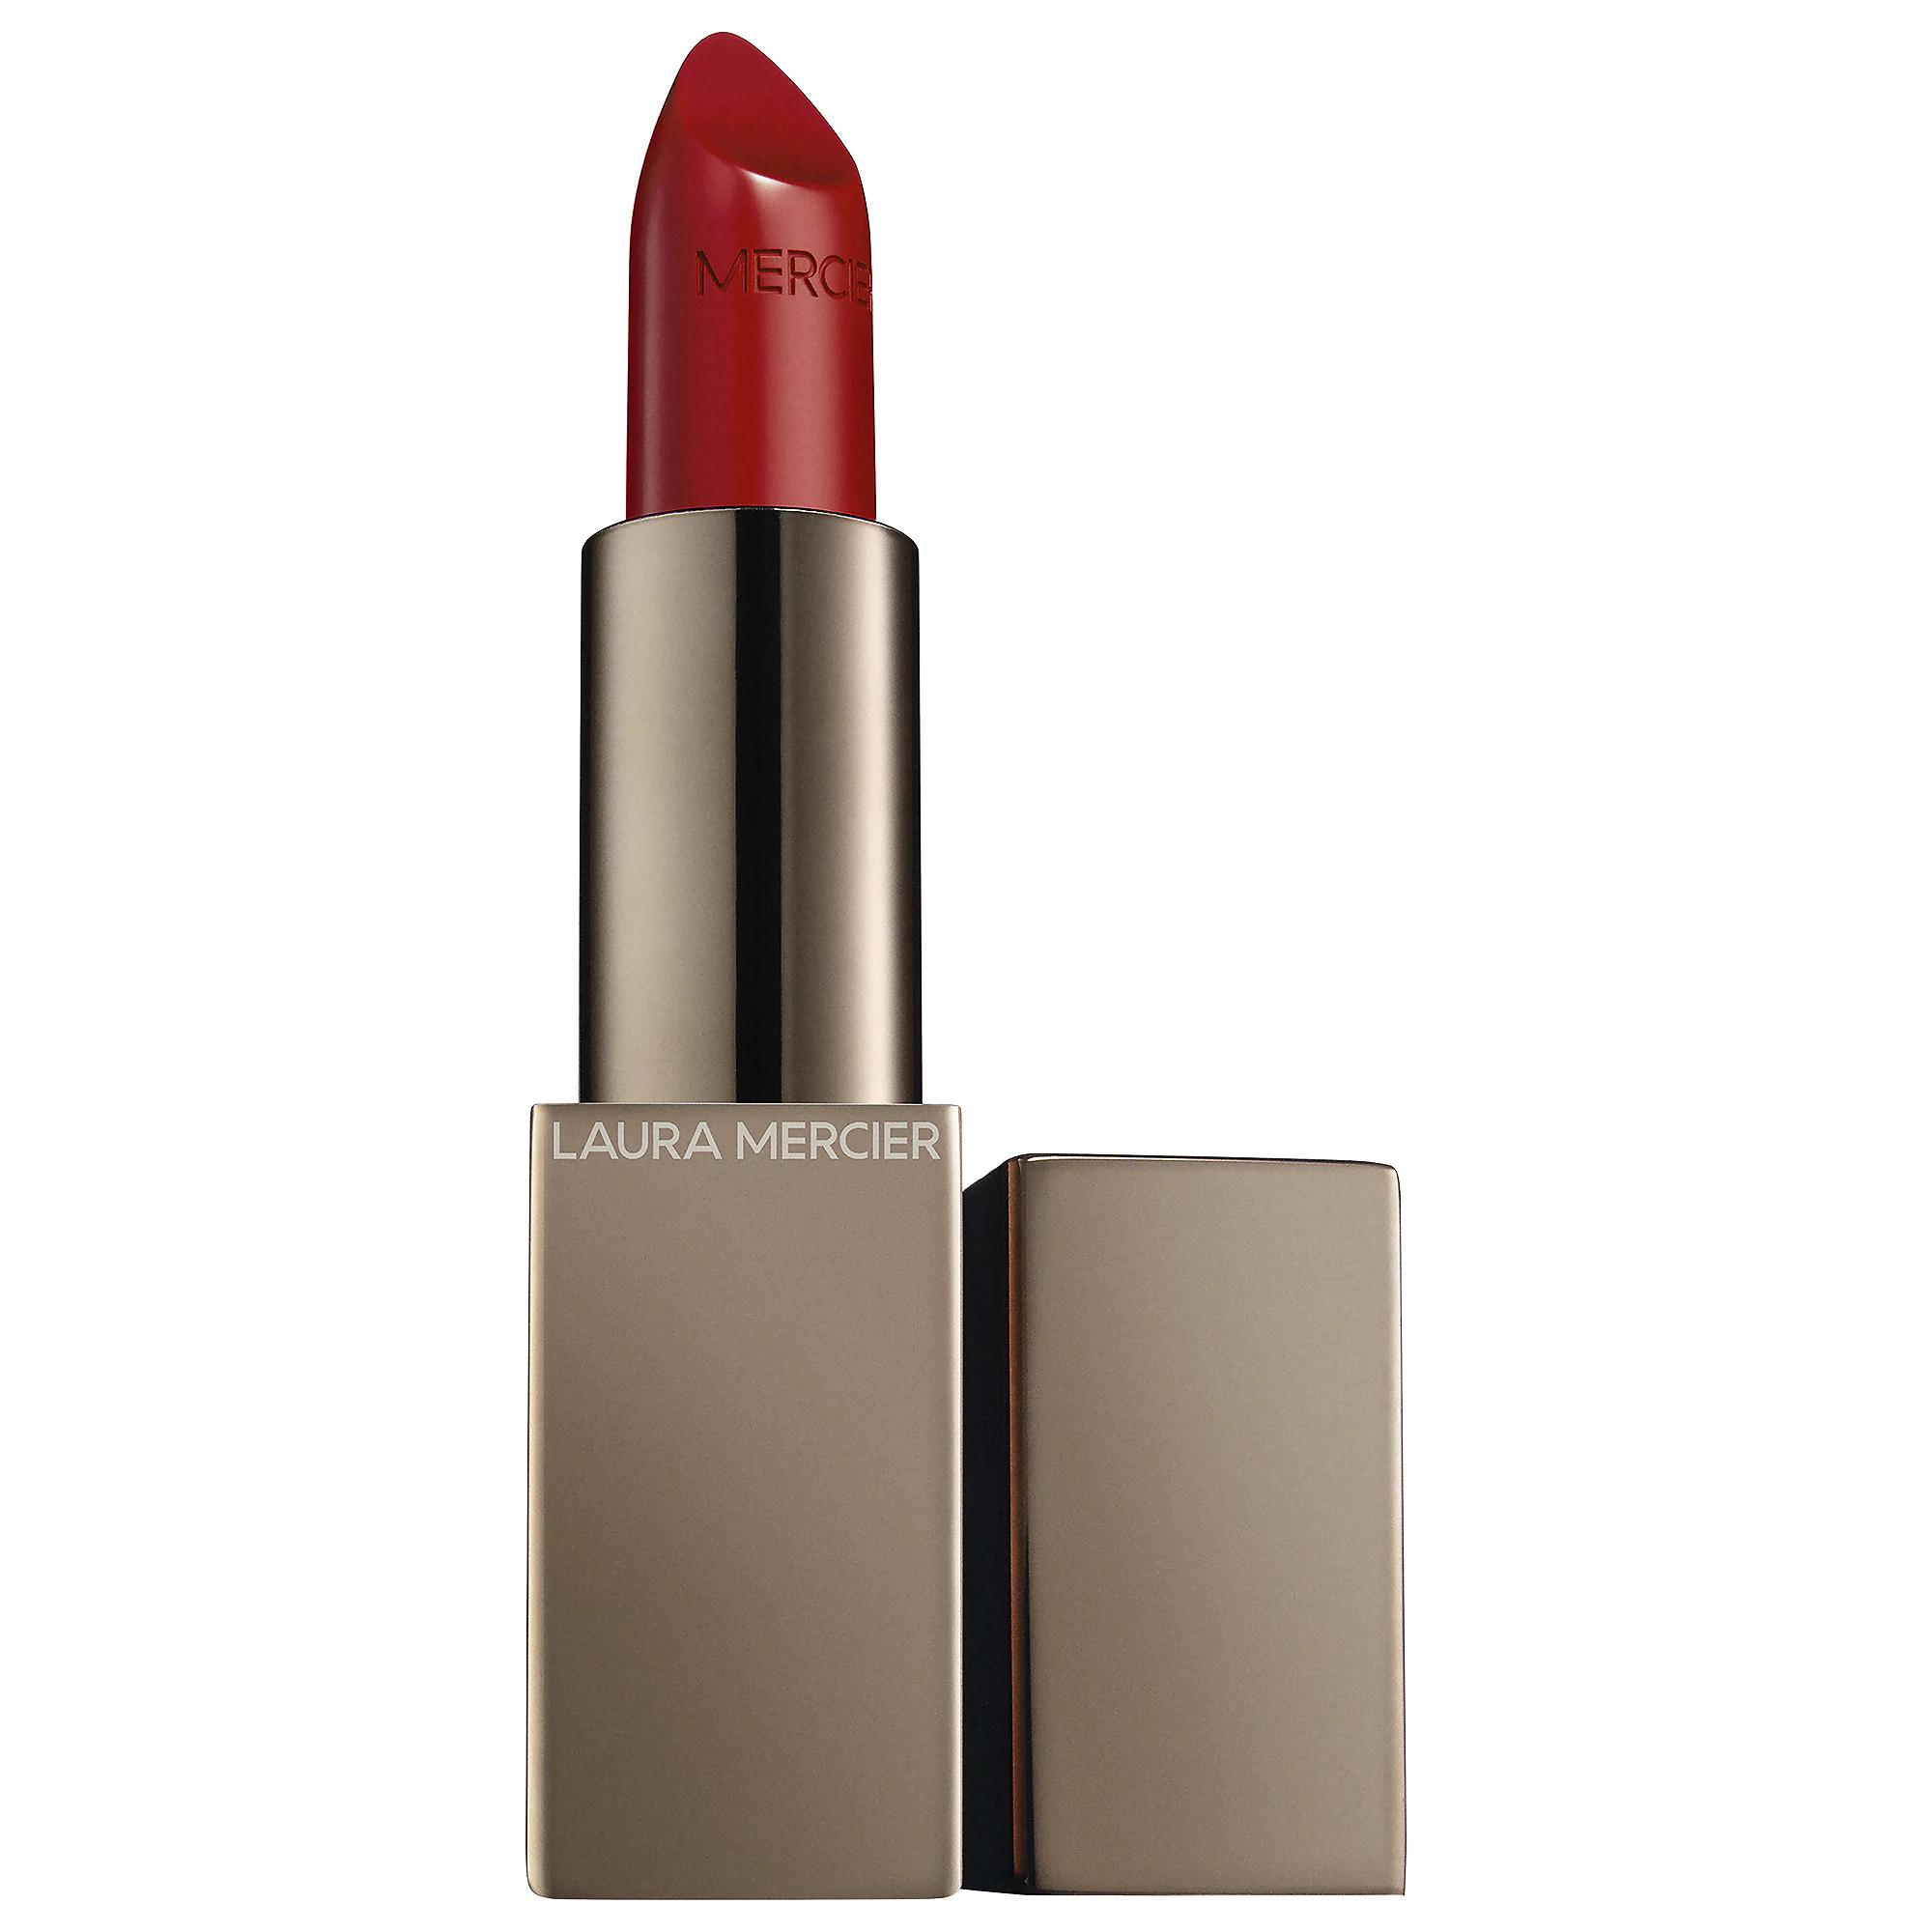 Laura Mercier Rouge Essentiel Silky Creme Lipstick Rouge Ultime